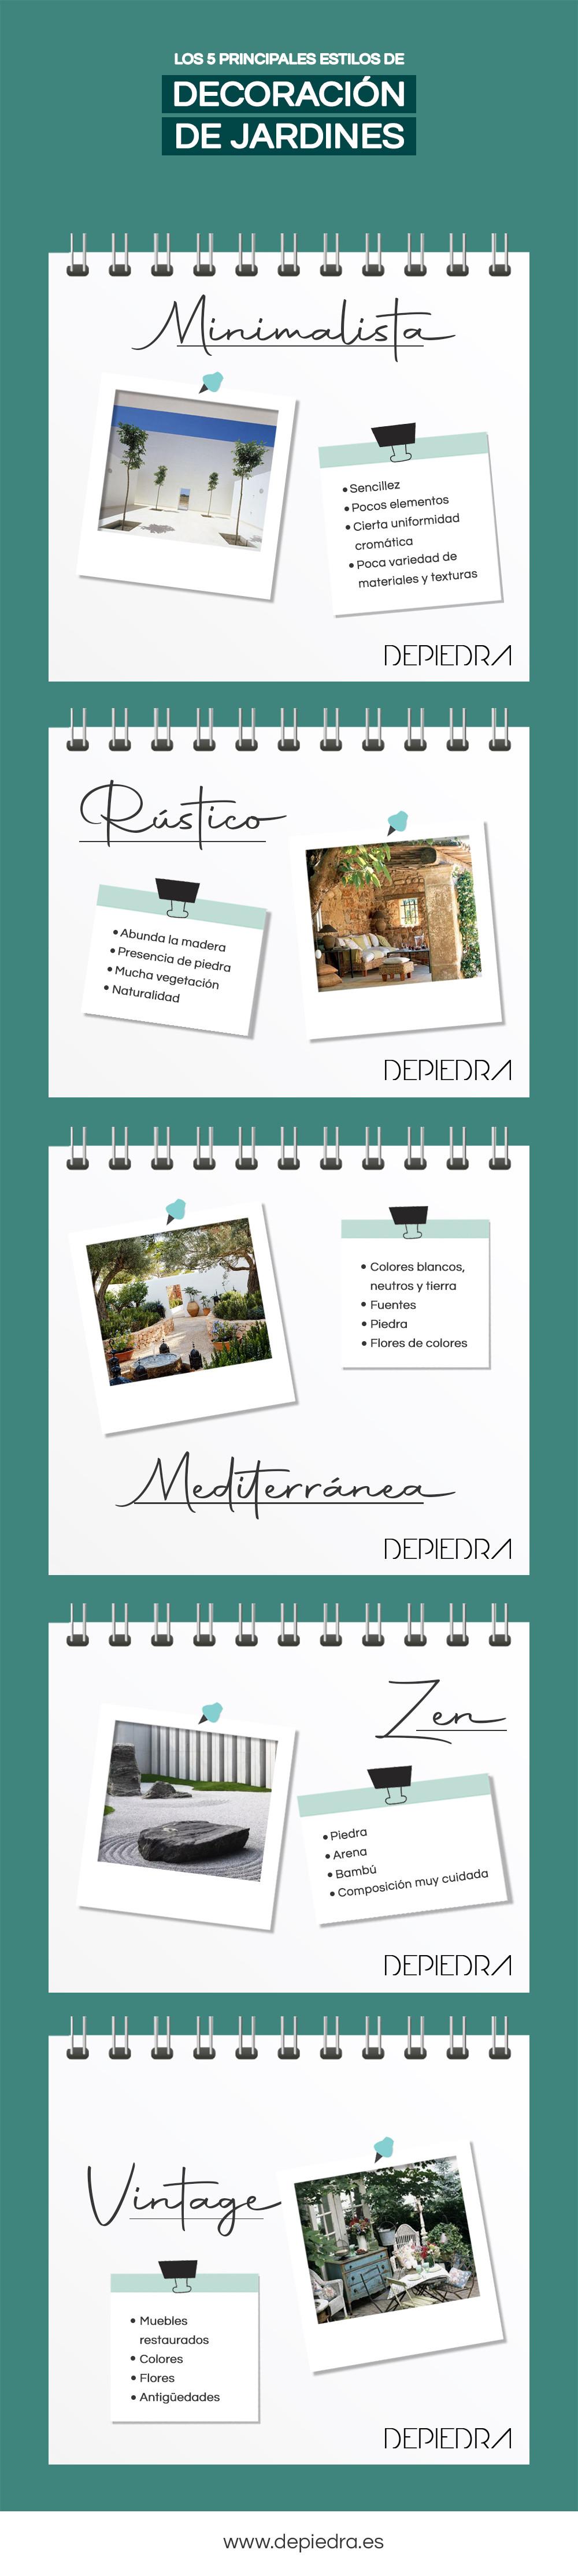 infografia estilos decoracion de jardines